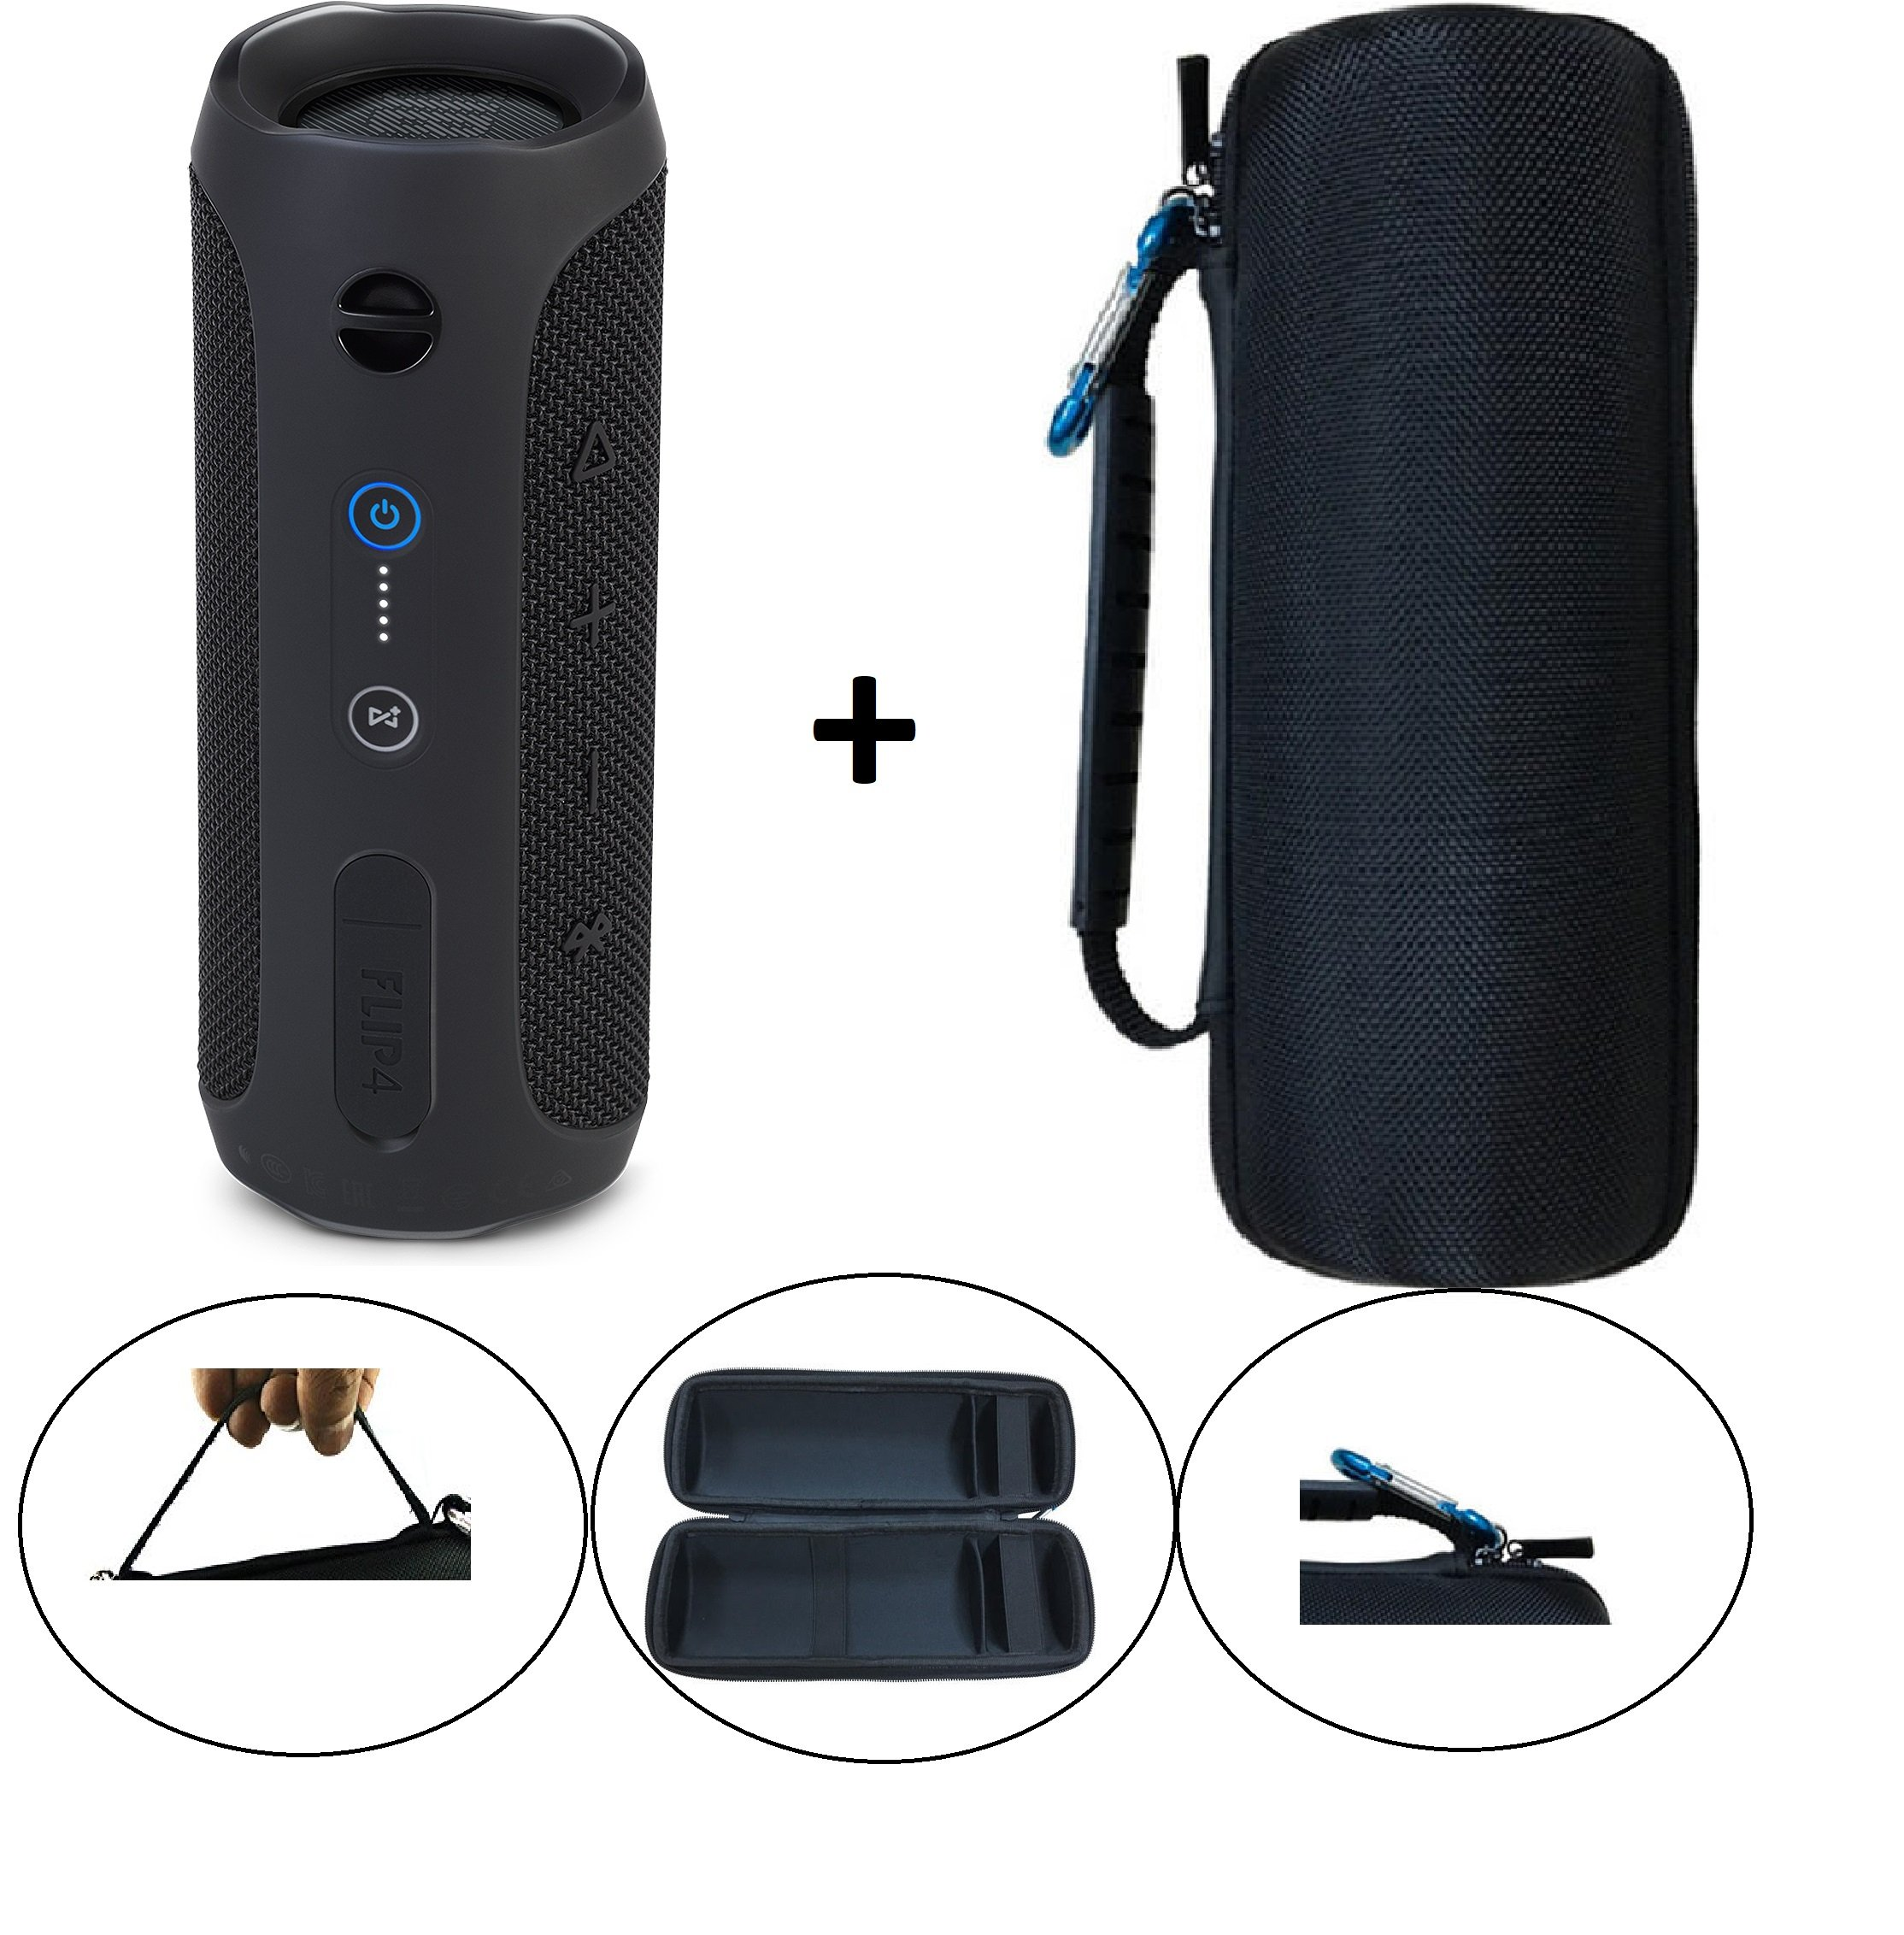 JBL Flip 4 Splash proof Portable Bluetooth speaker, Black PLUS Protective Hard Cover Portable Case, Black